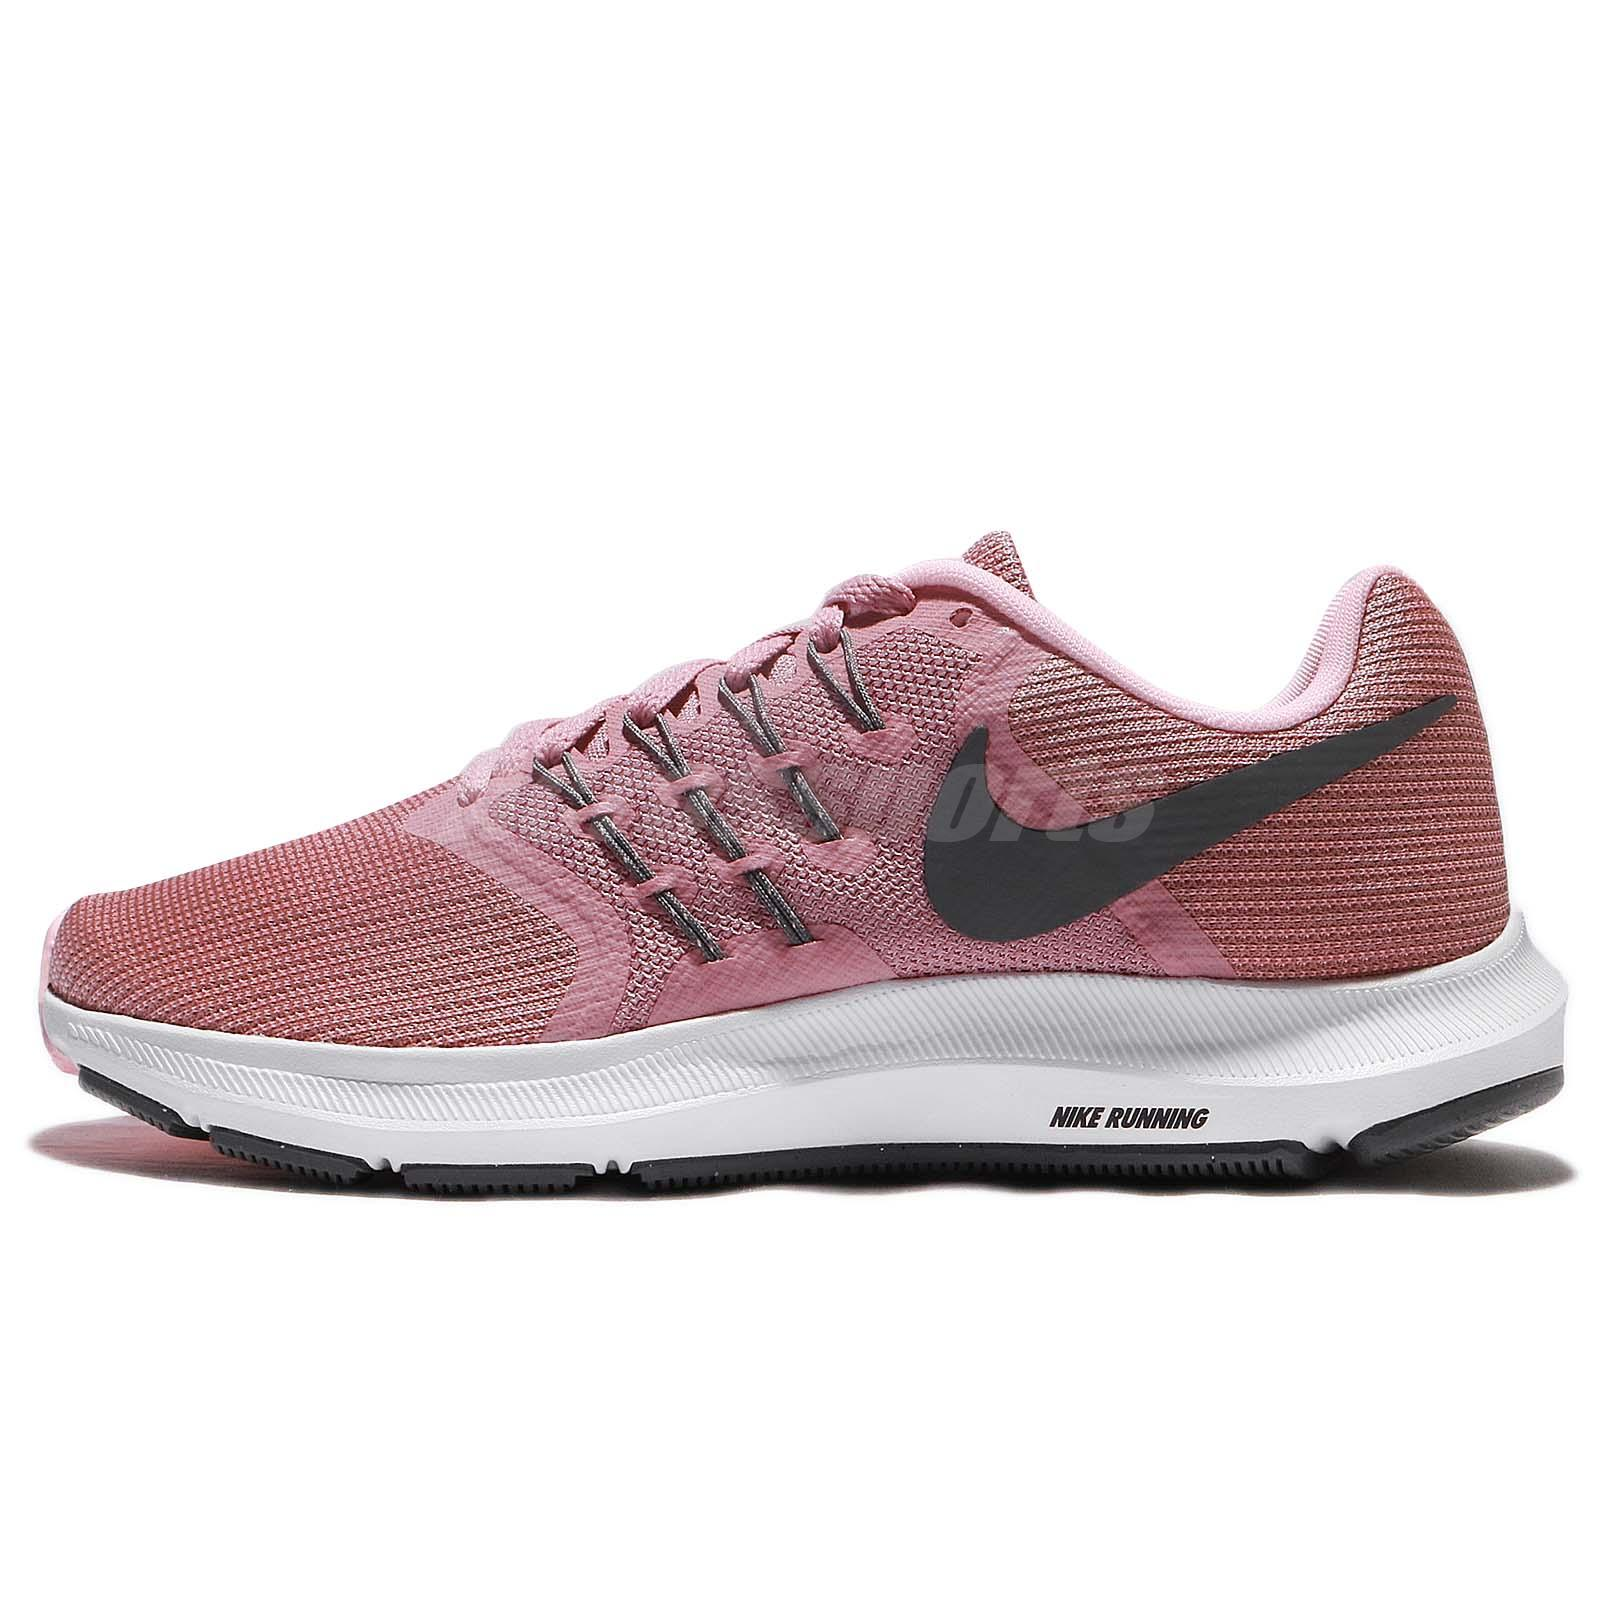 Buying Nike Shoes In Vietnam